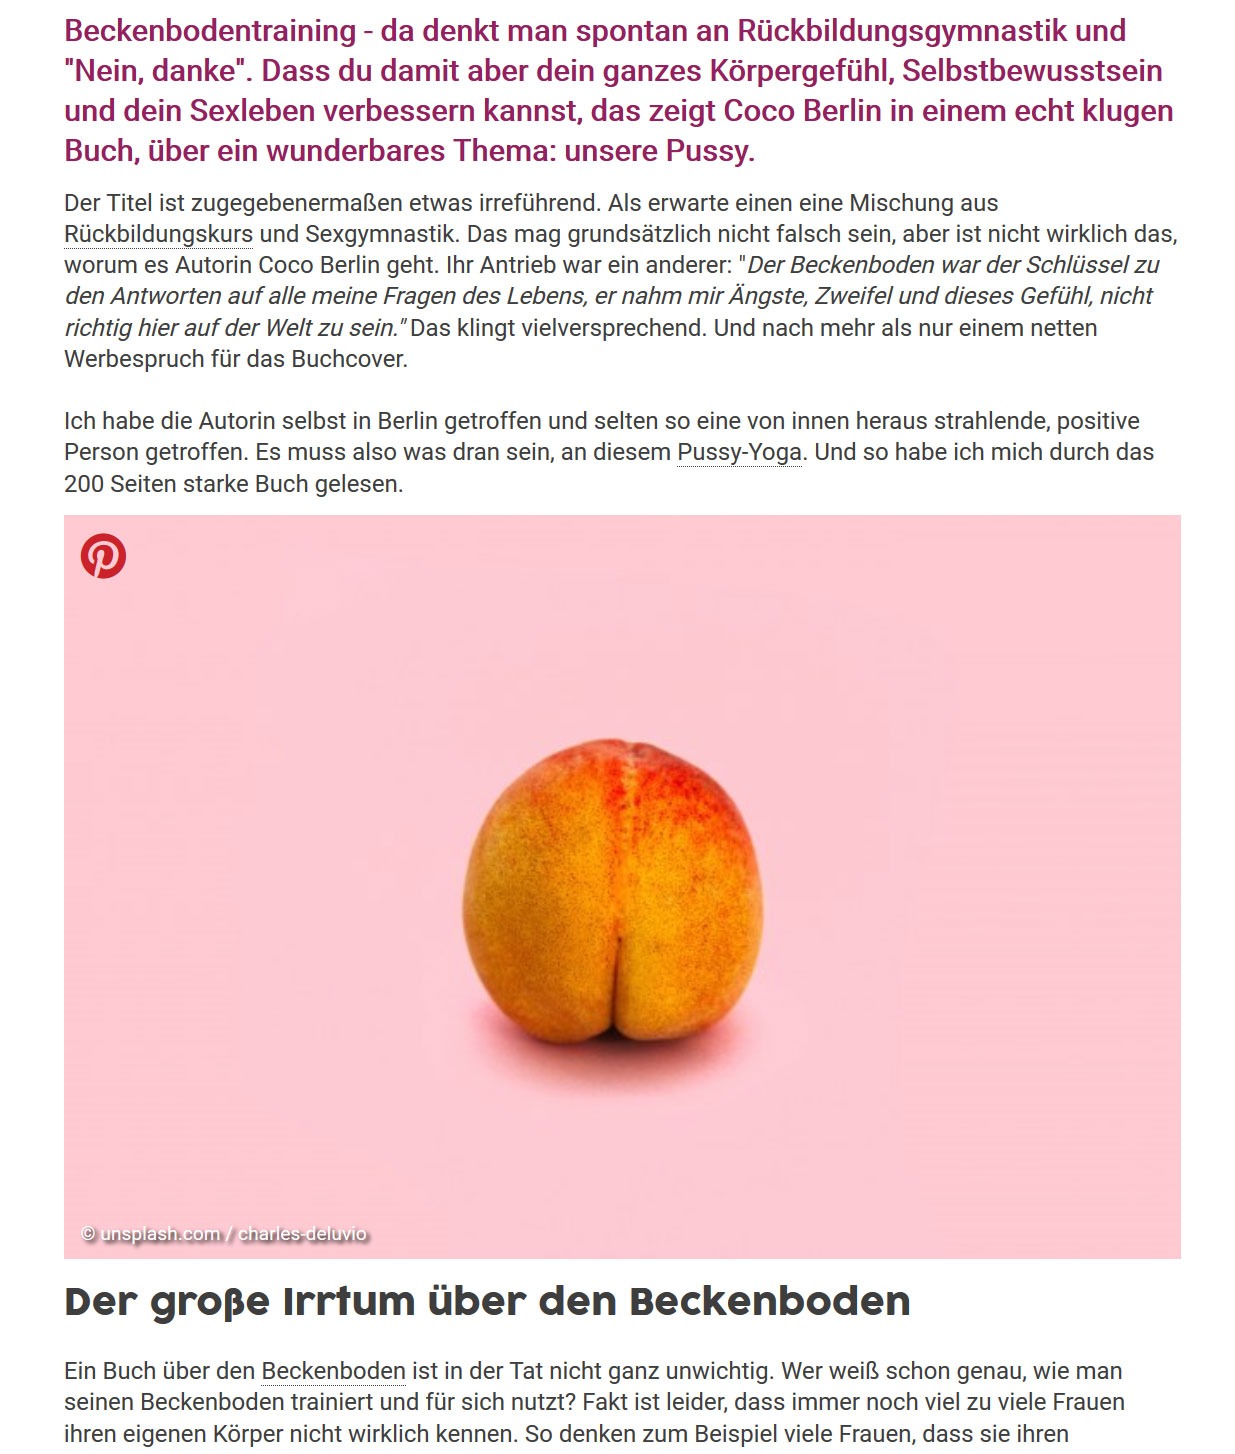 gofeminin-pussy-yoga-coco-berlin-02.jpg